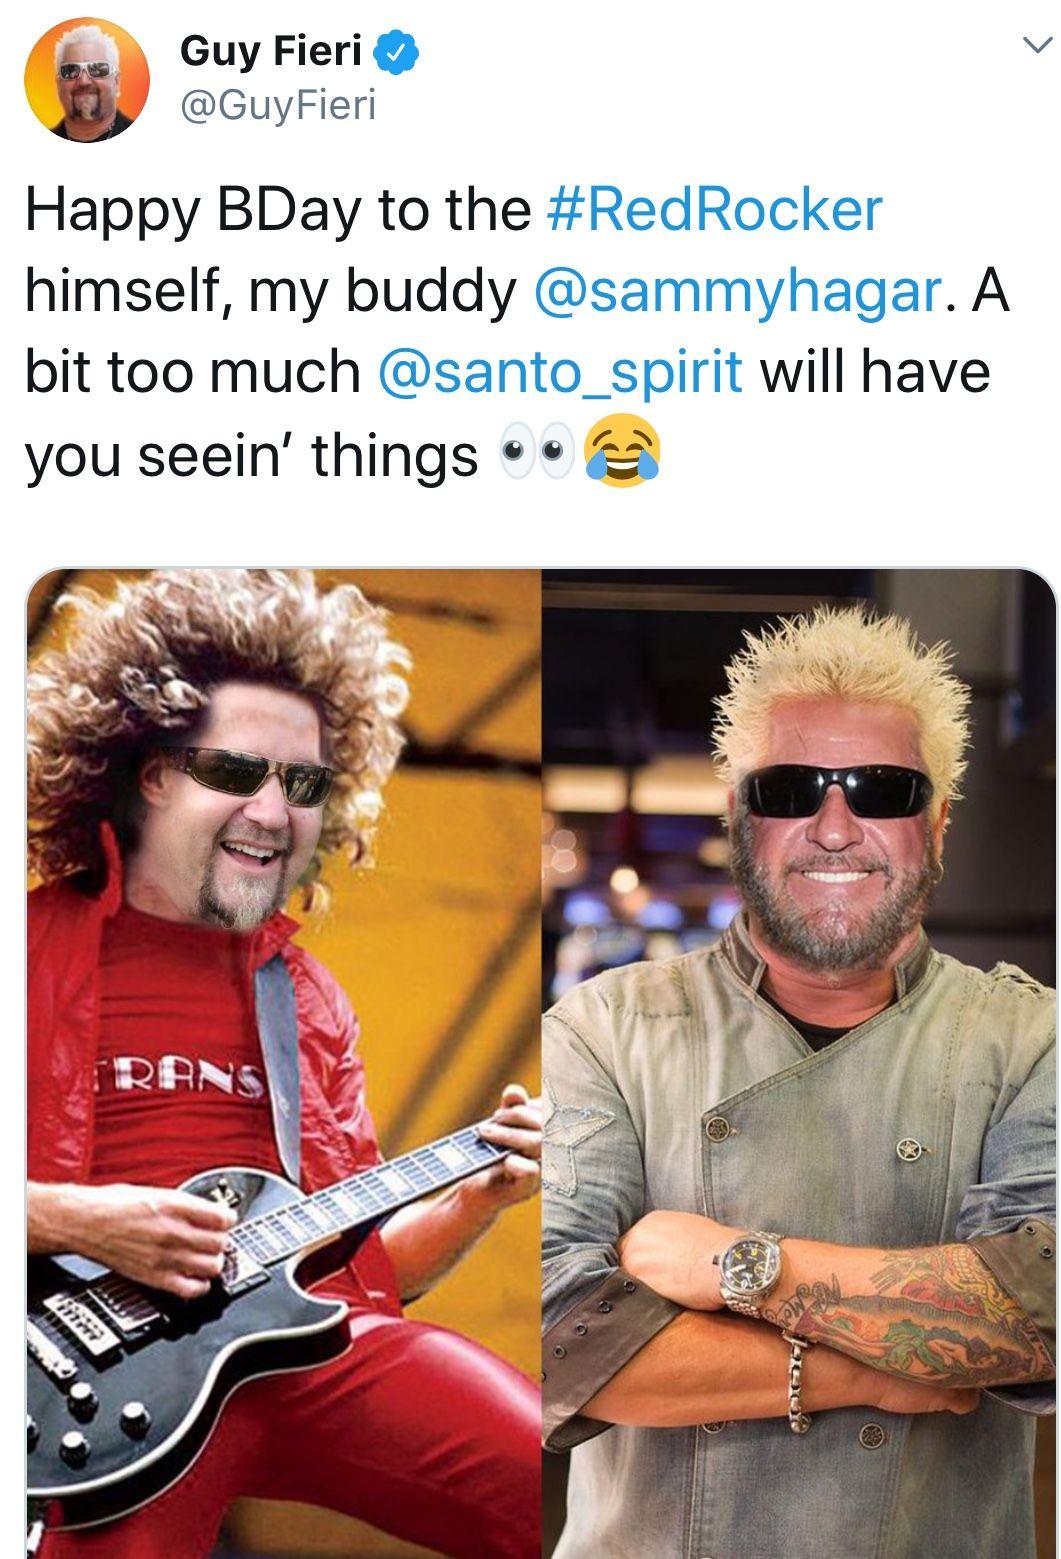 Pin By Shari On Sammy Hagar Van Hagar Guy Fieri Red Rocker My Buddy